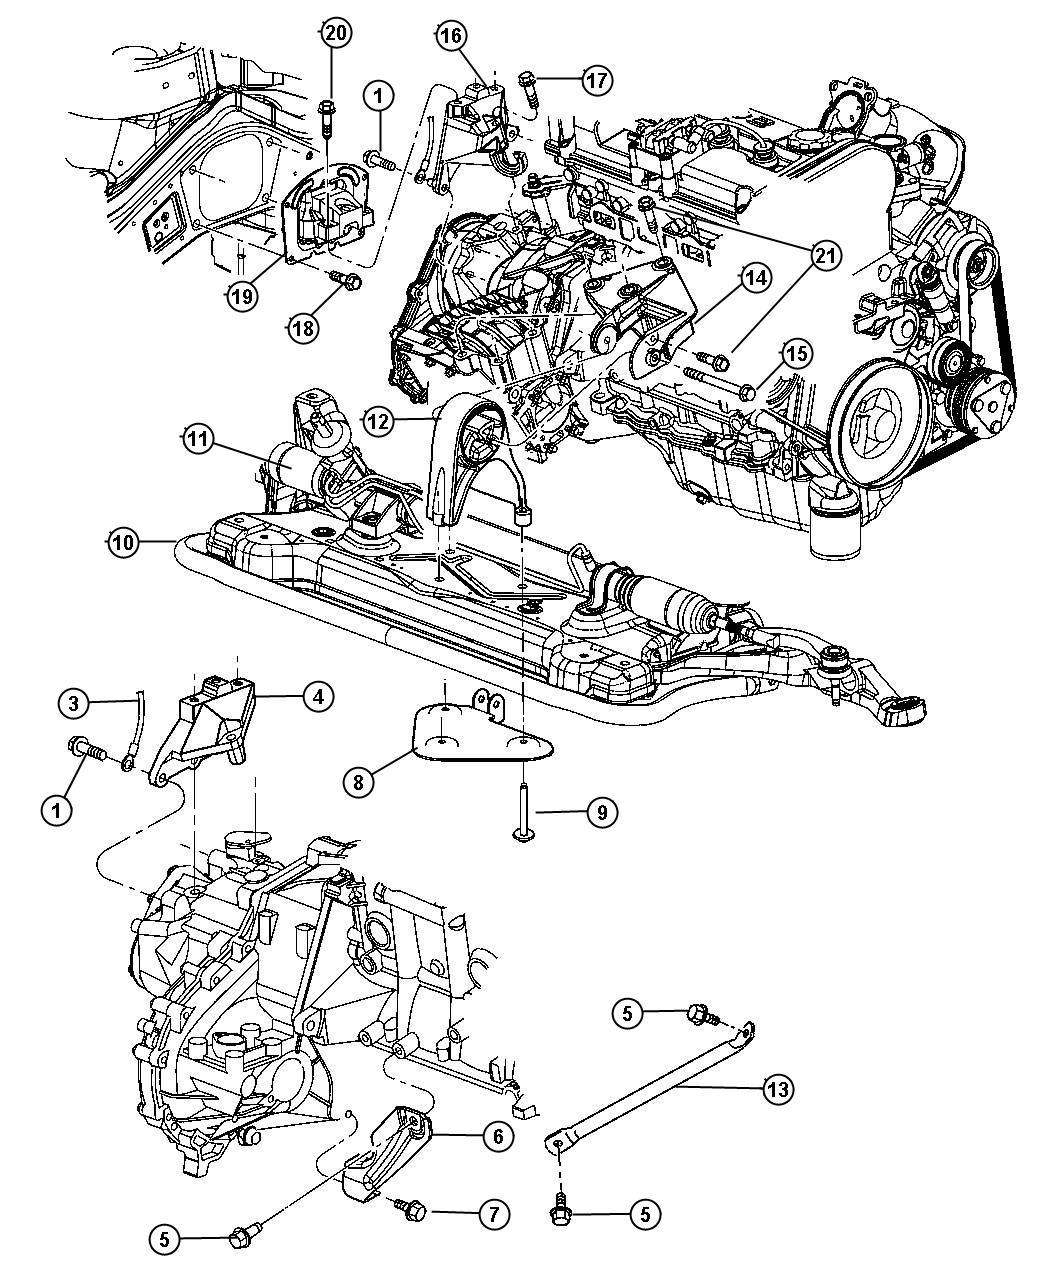 98 Chrysler Sebring WiringDiagram